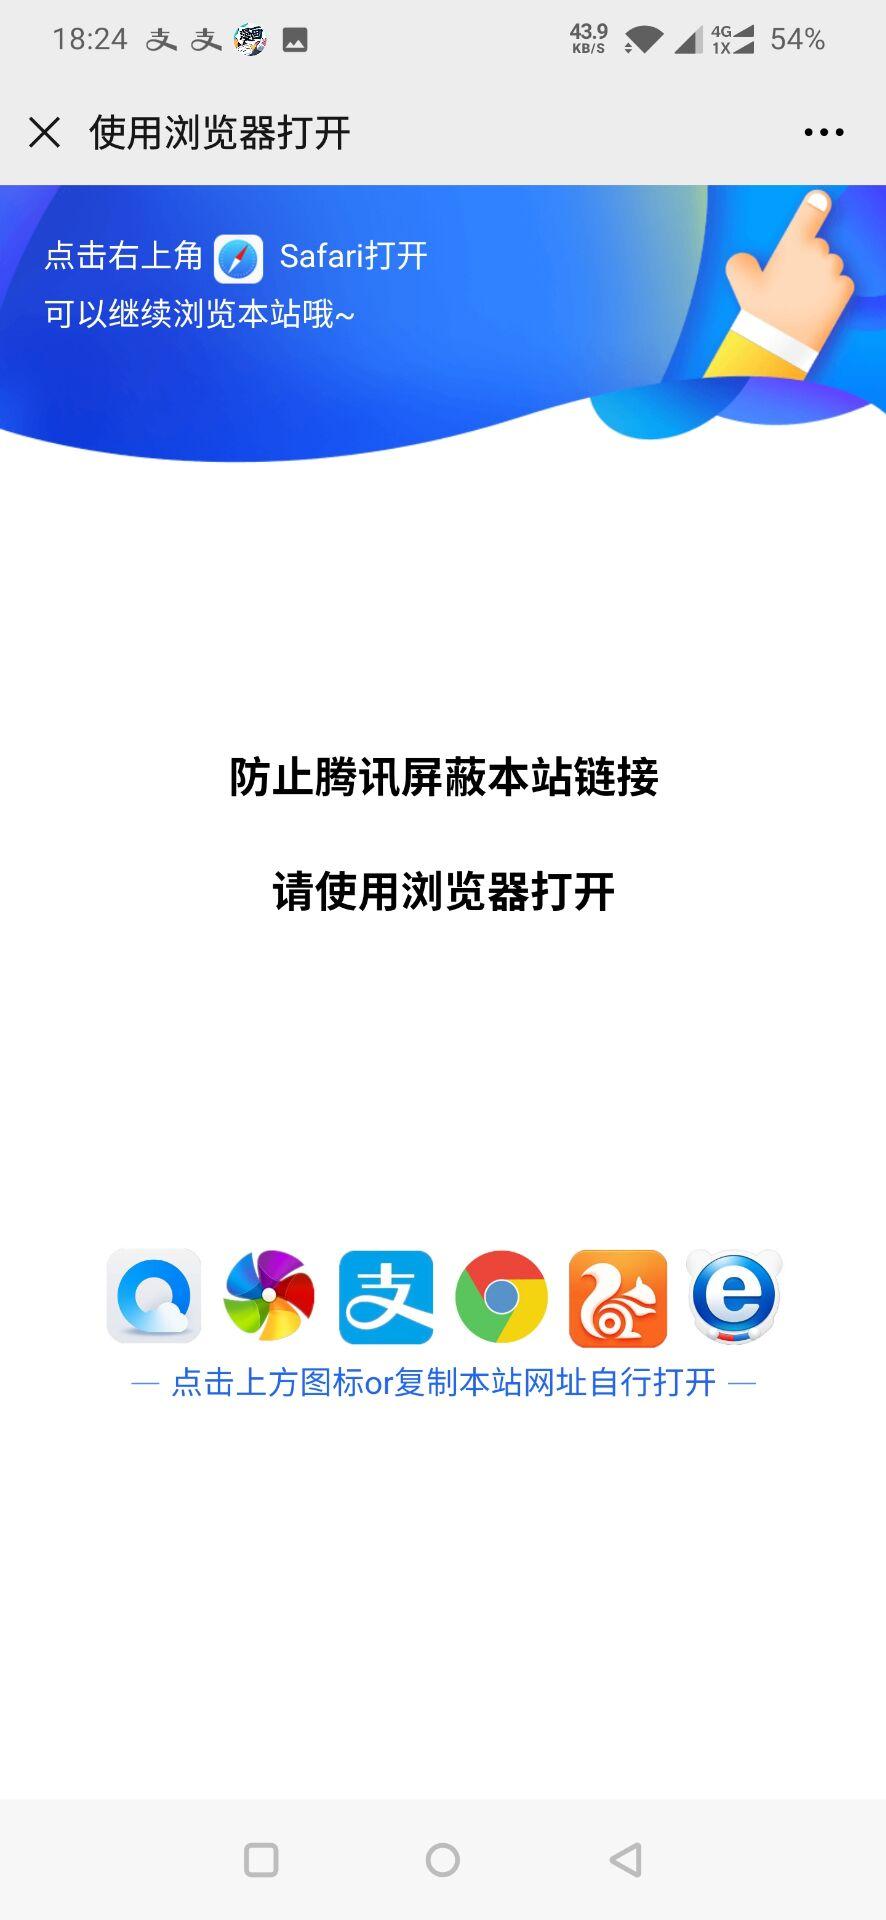 QQ微信防红跳转浏览器打开源代码